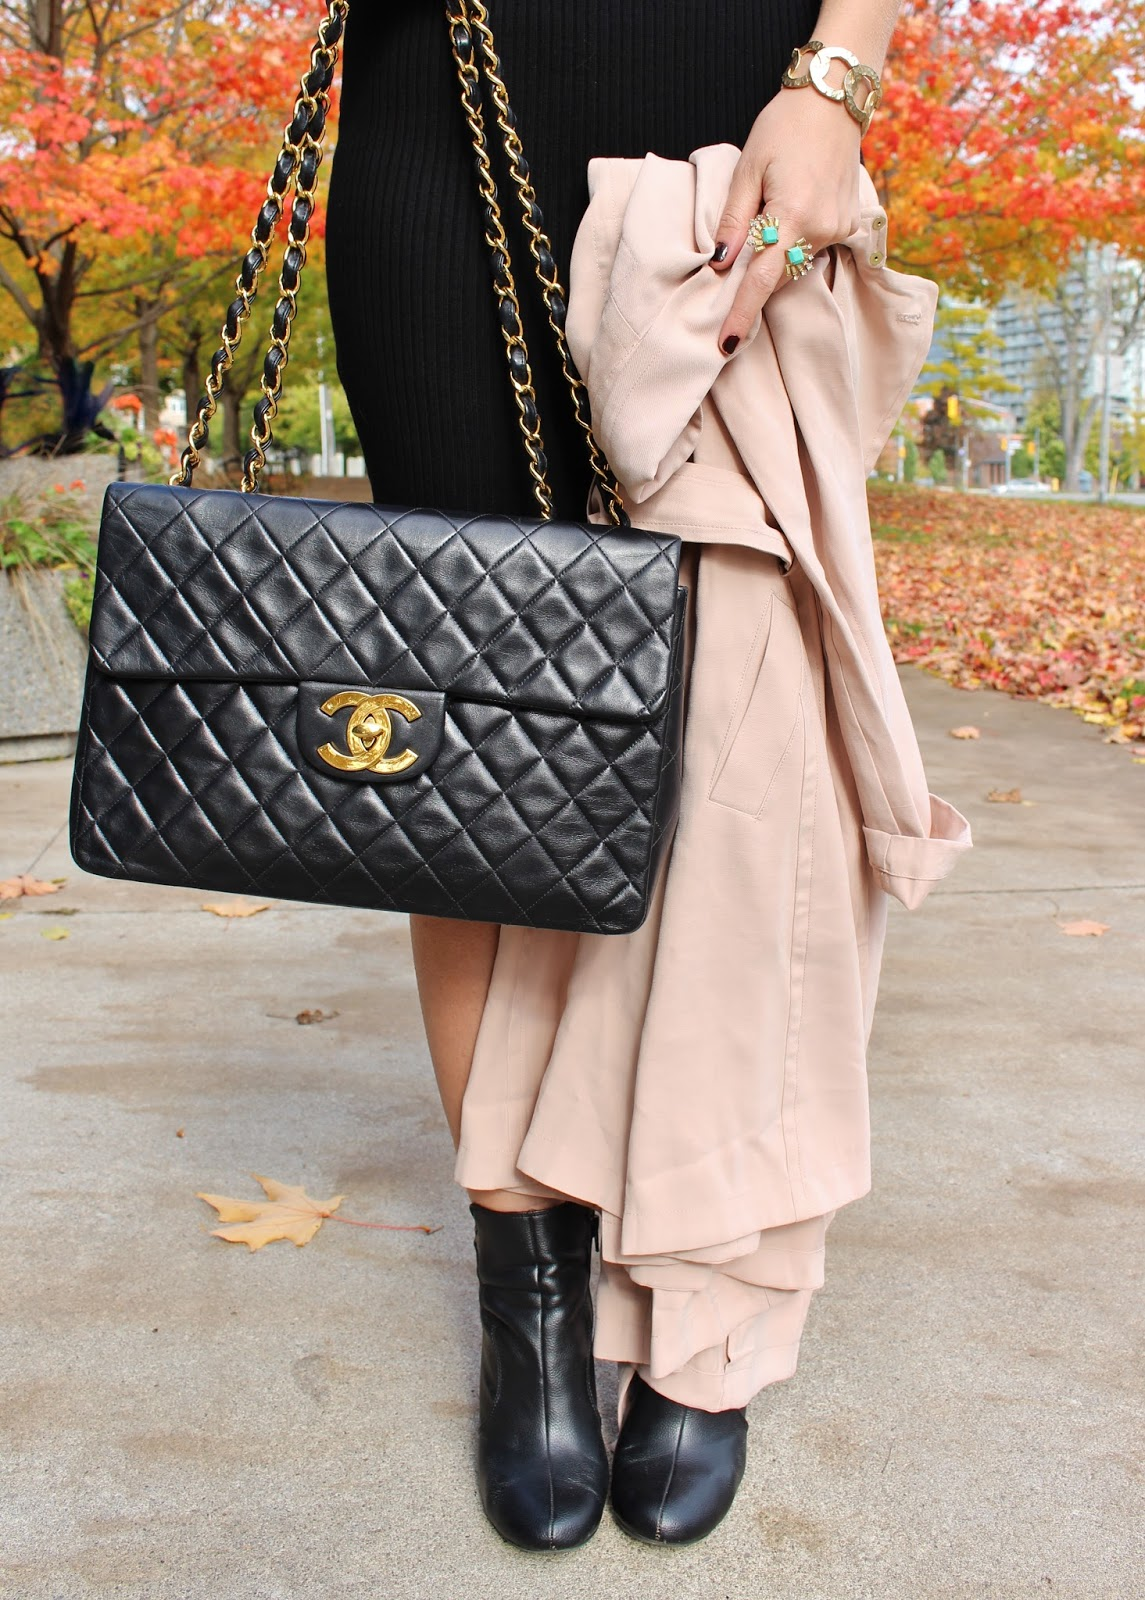 Bijuleni - Vintage Chanel jumbo xl handbag